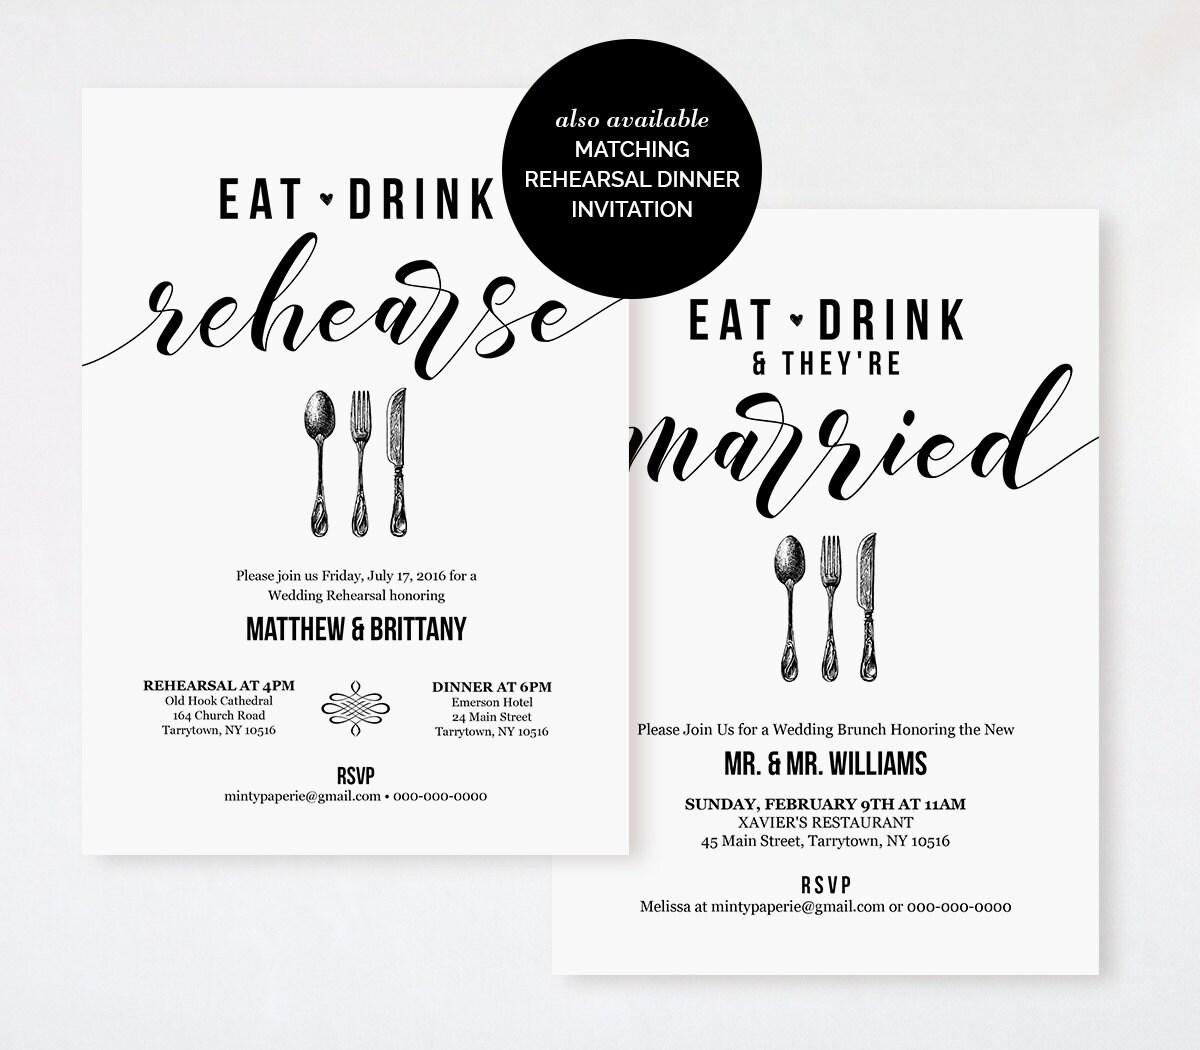 post wedding brunch invitations. wedding invitations by lavender, Wedding invitations